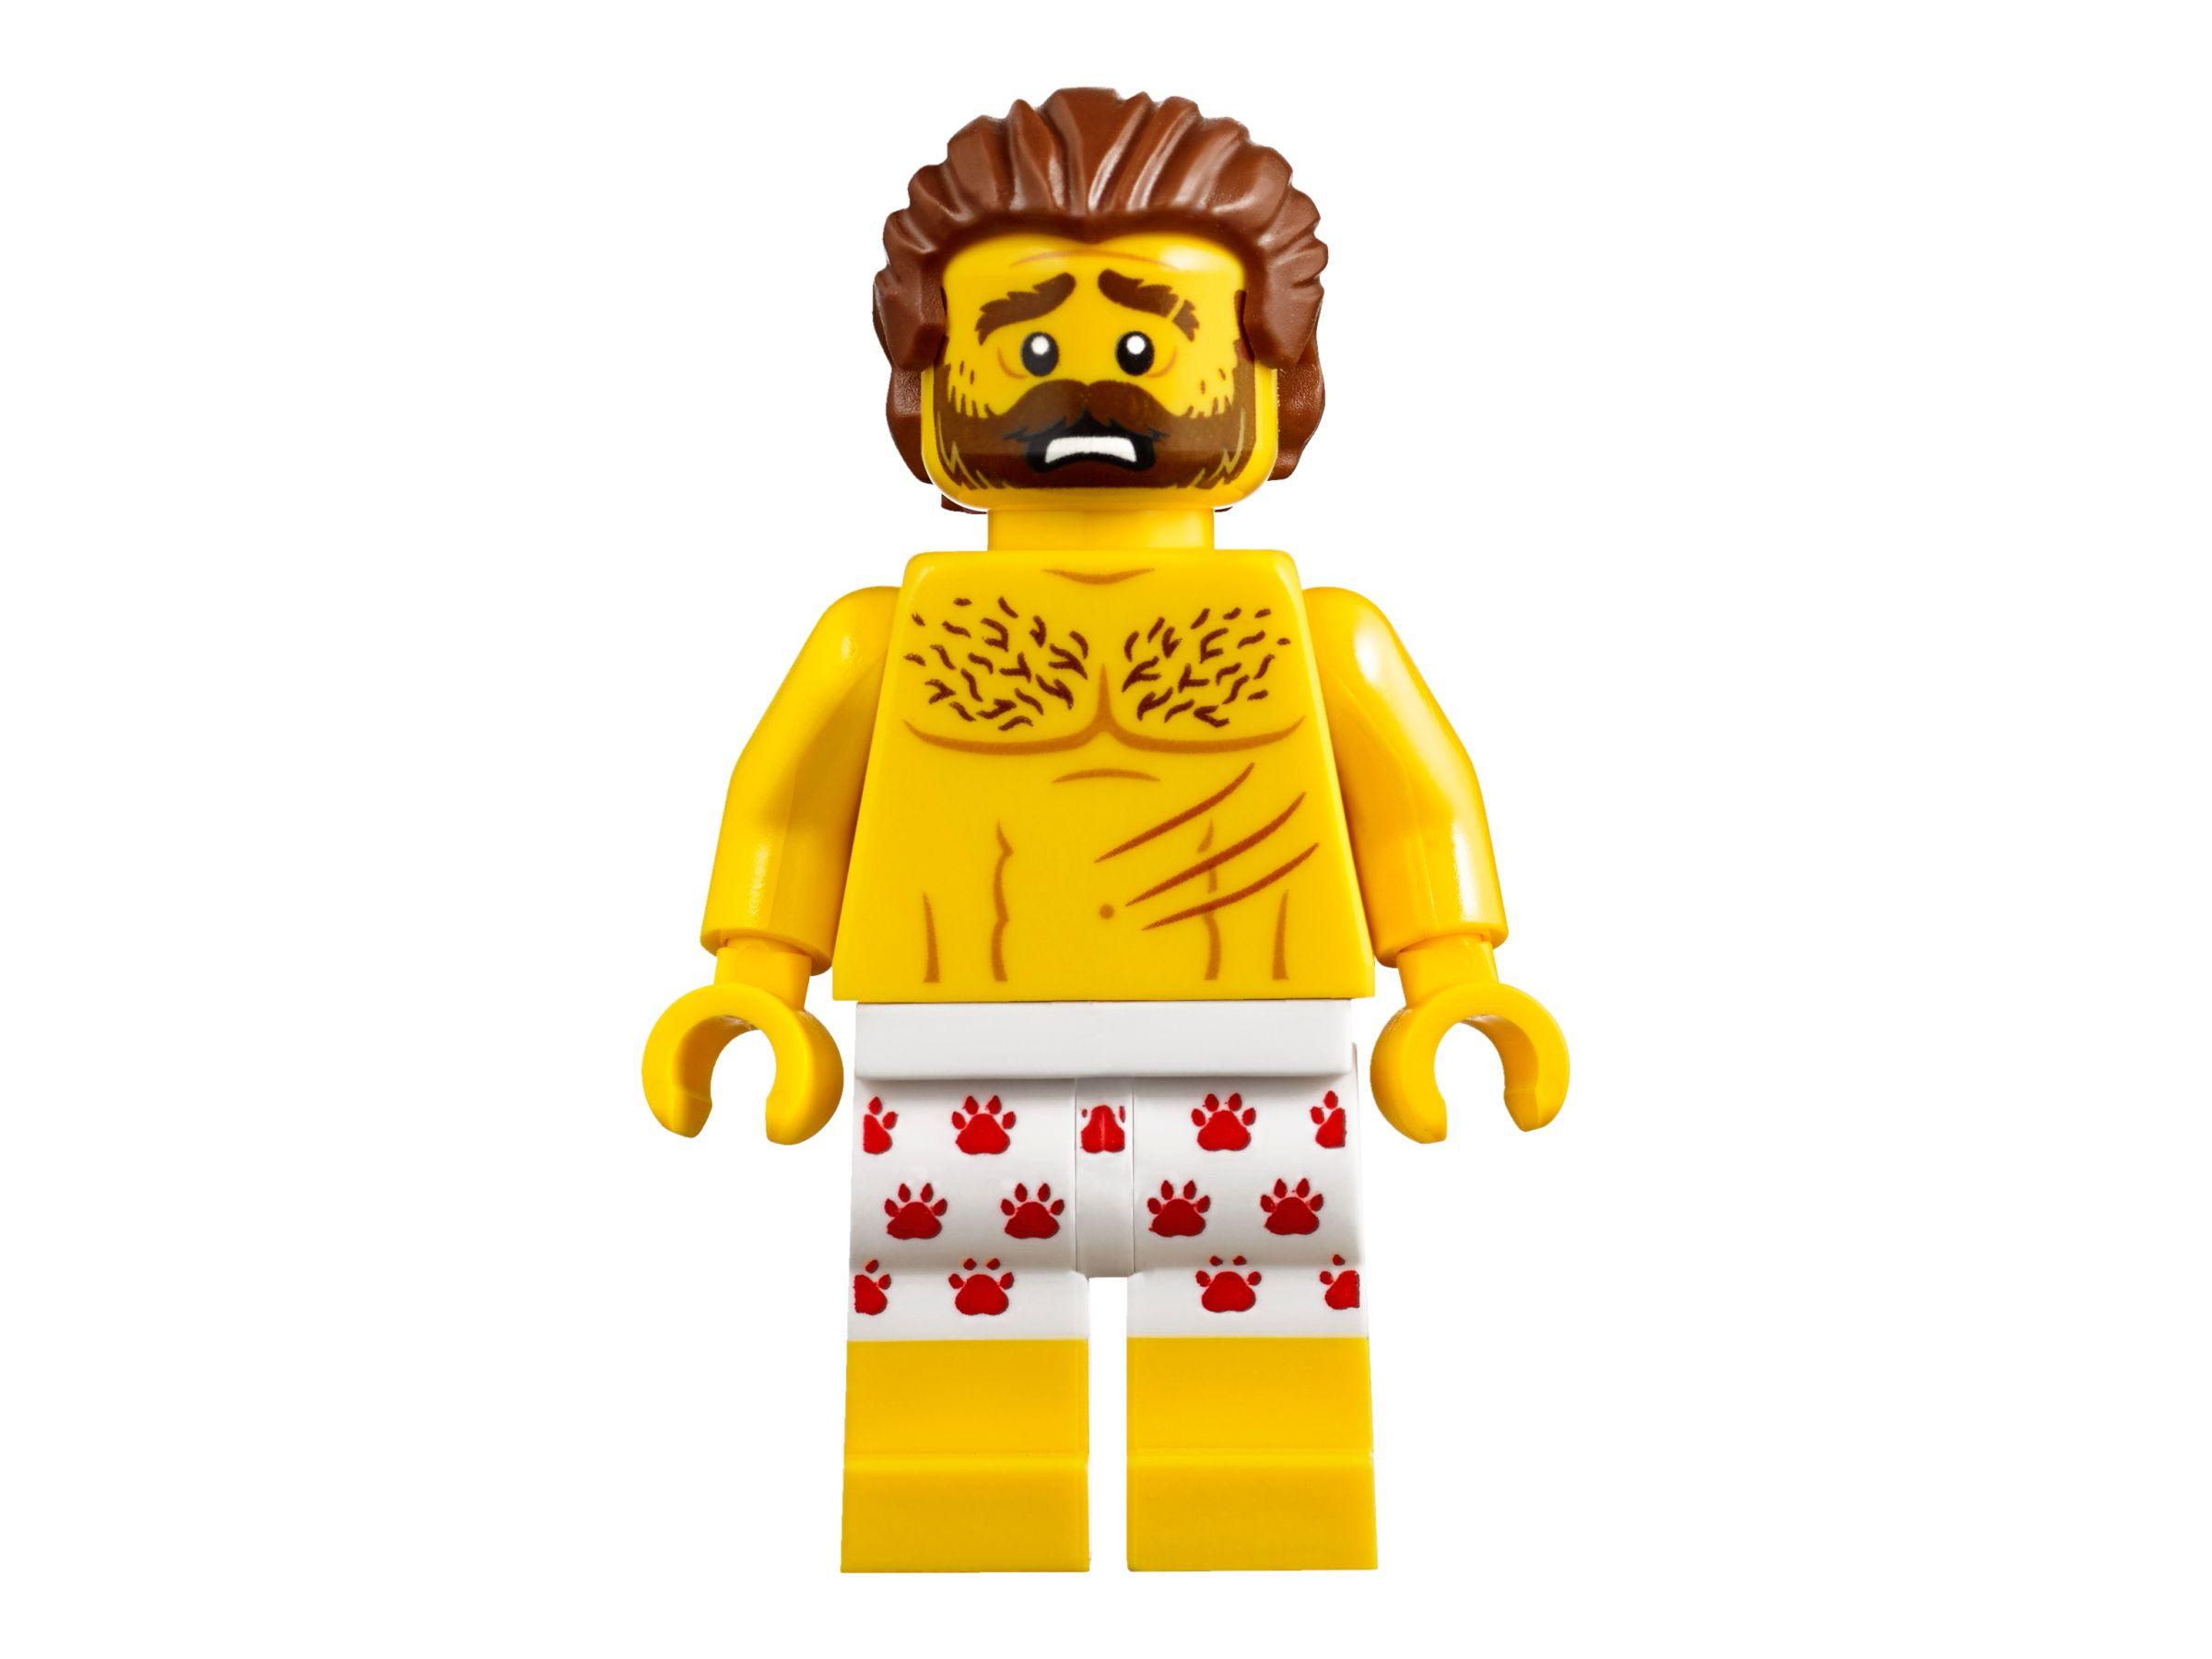 Risultati immagini per lego 60173 minifigures